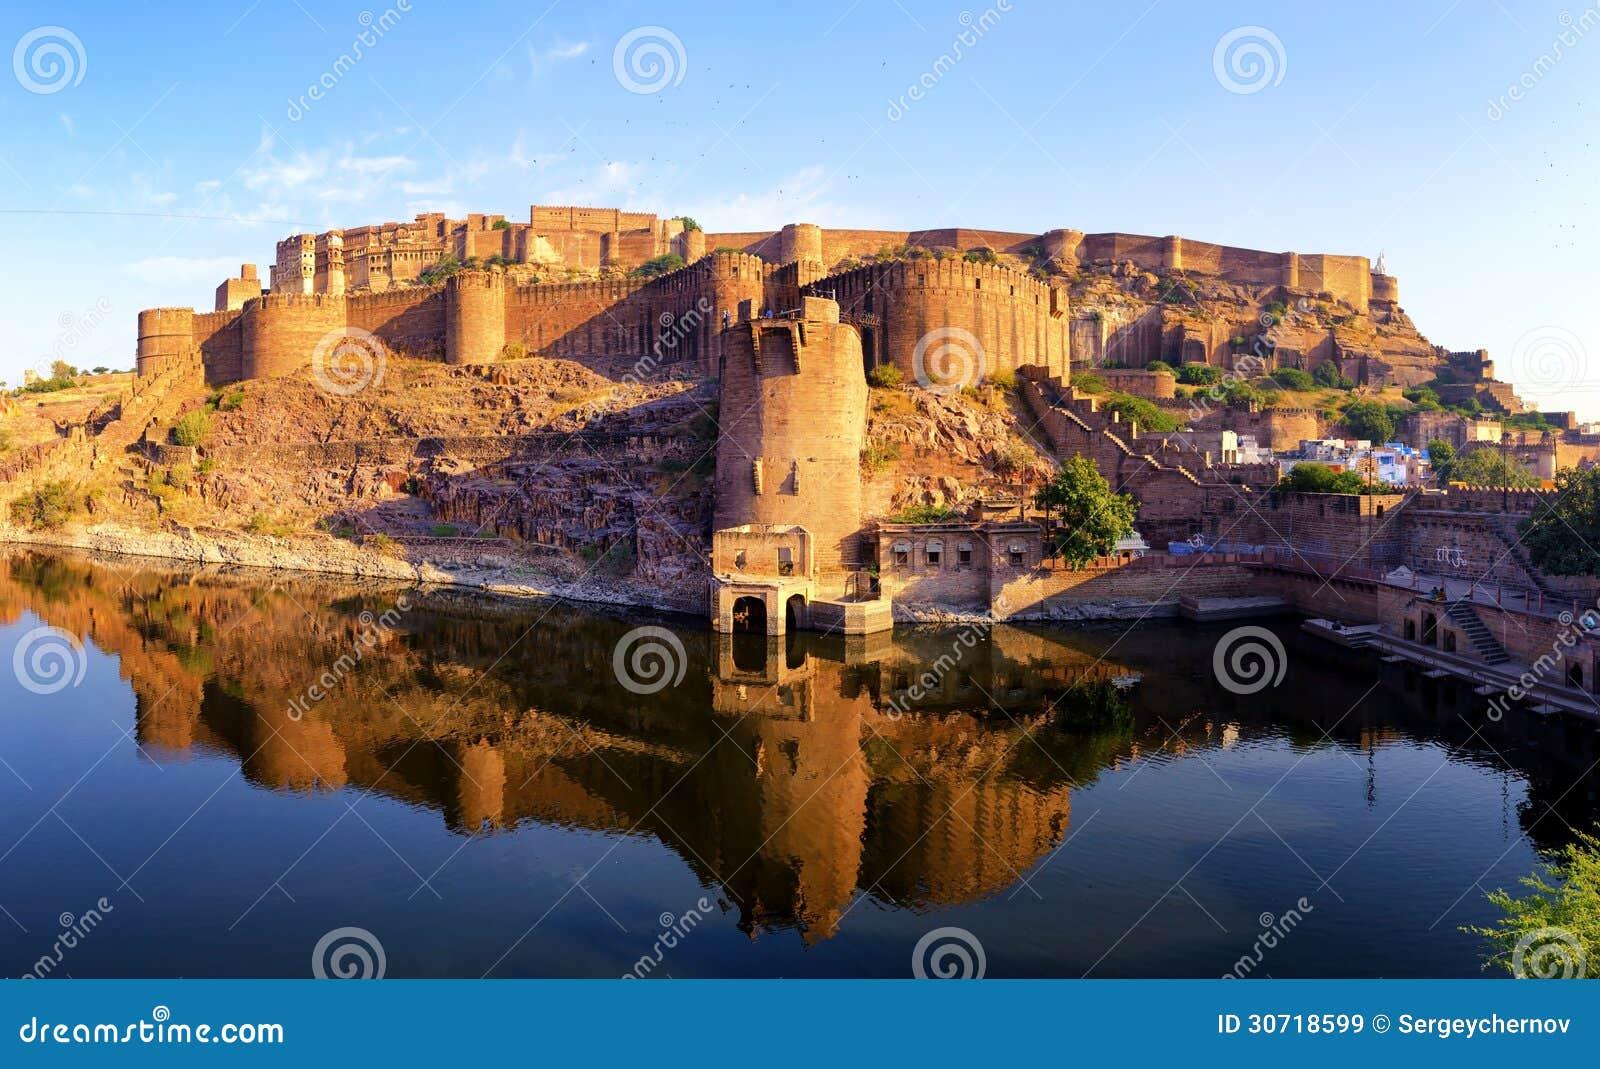 Mehrangarh Fort Jodhpur Rajasthan India Indian Palace Stock Image Image 30718599